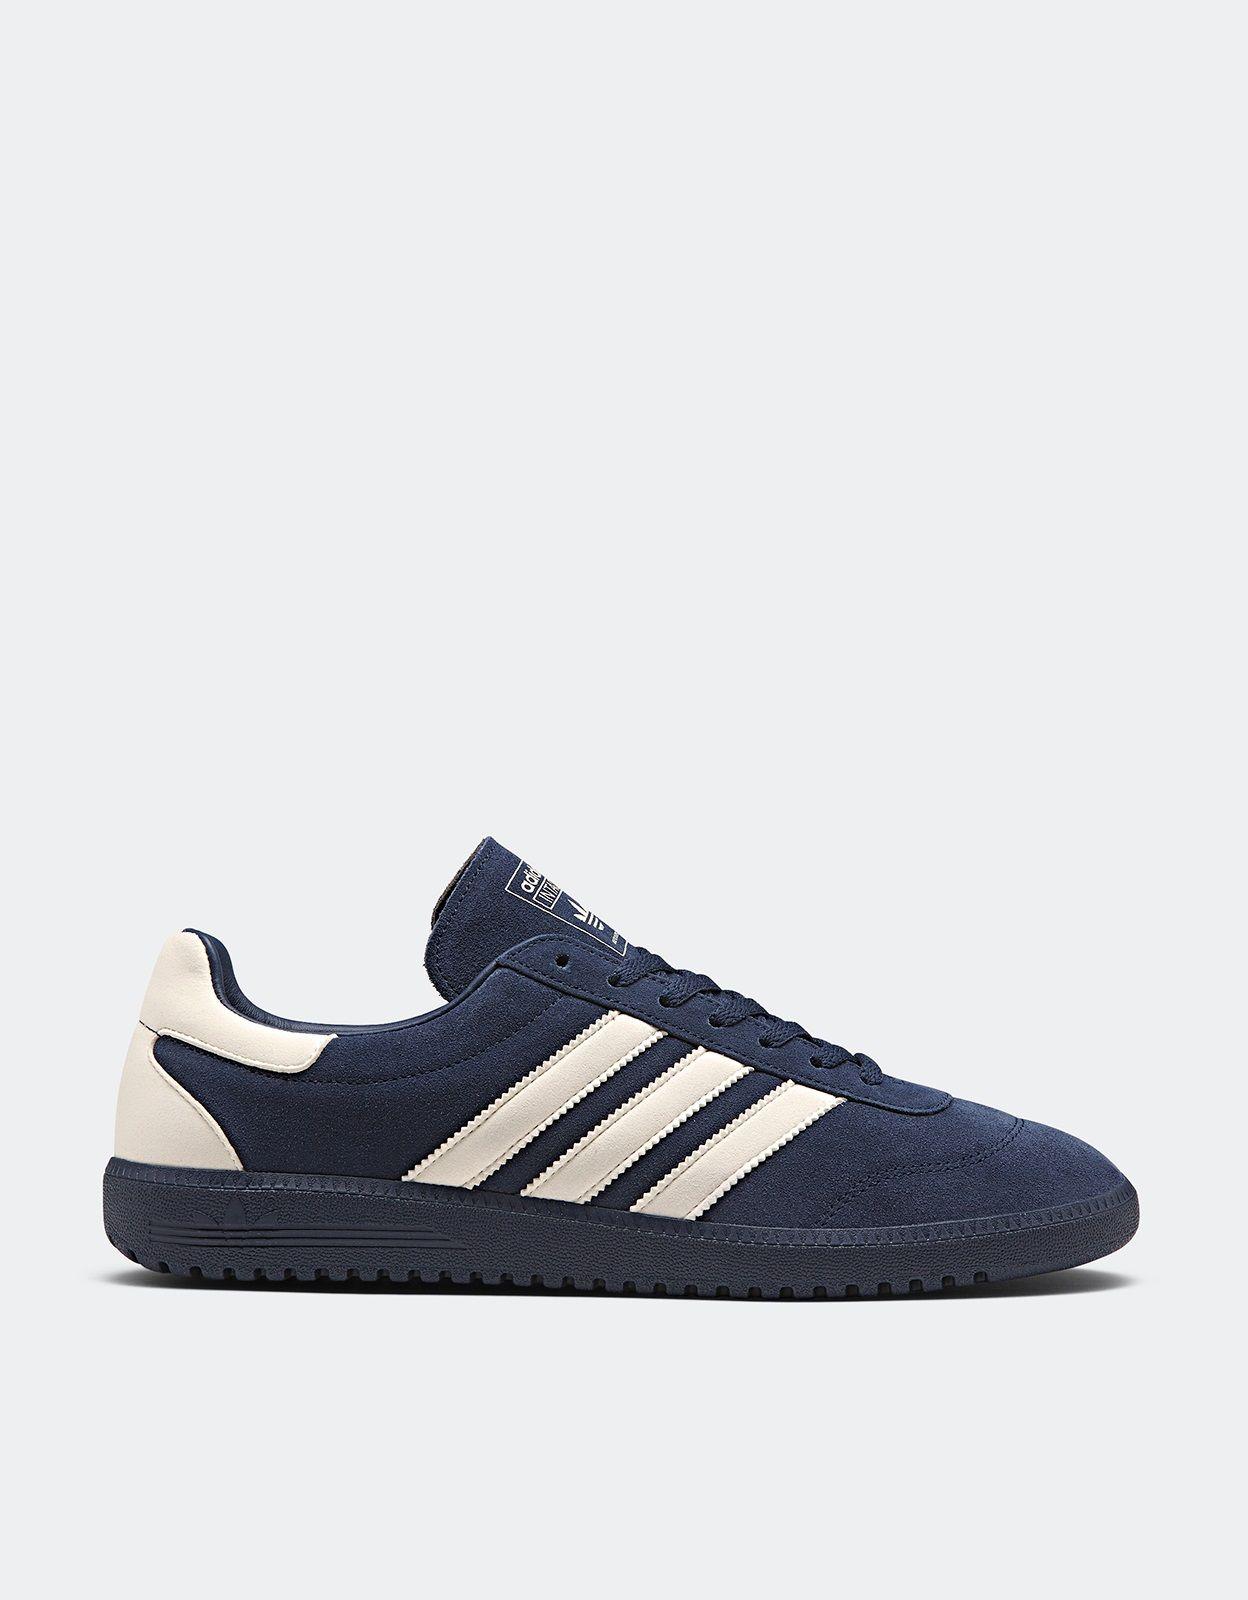 classic fit badea 7f138 adidas Originals Intack SPZL. adidas Originals Intack SPZL Cool Trainers,  Adidas Spezial, Casual Sneakers, Casual Shoes,